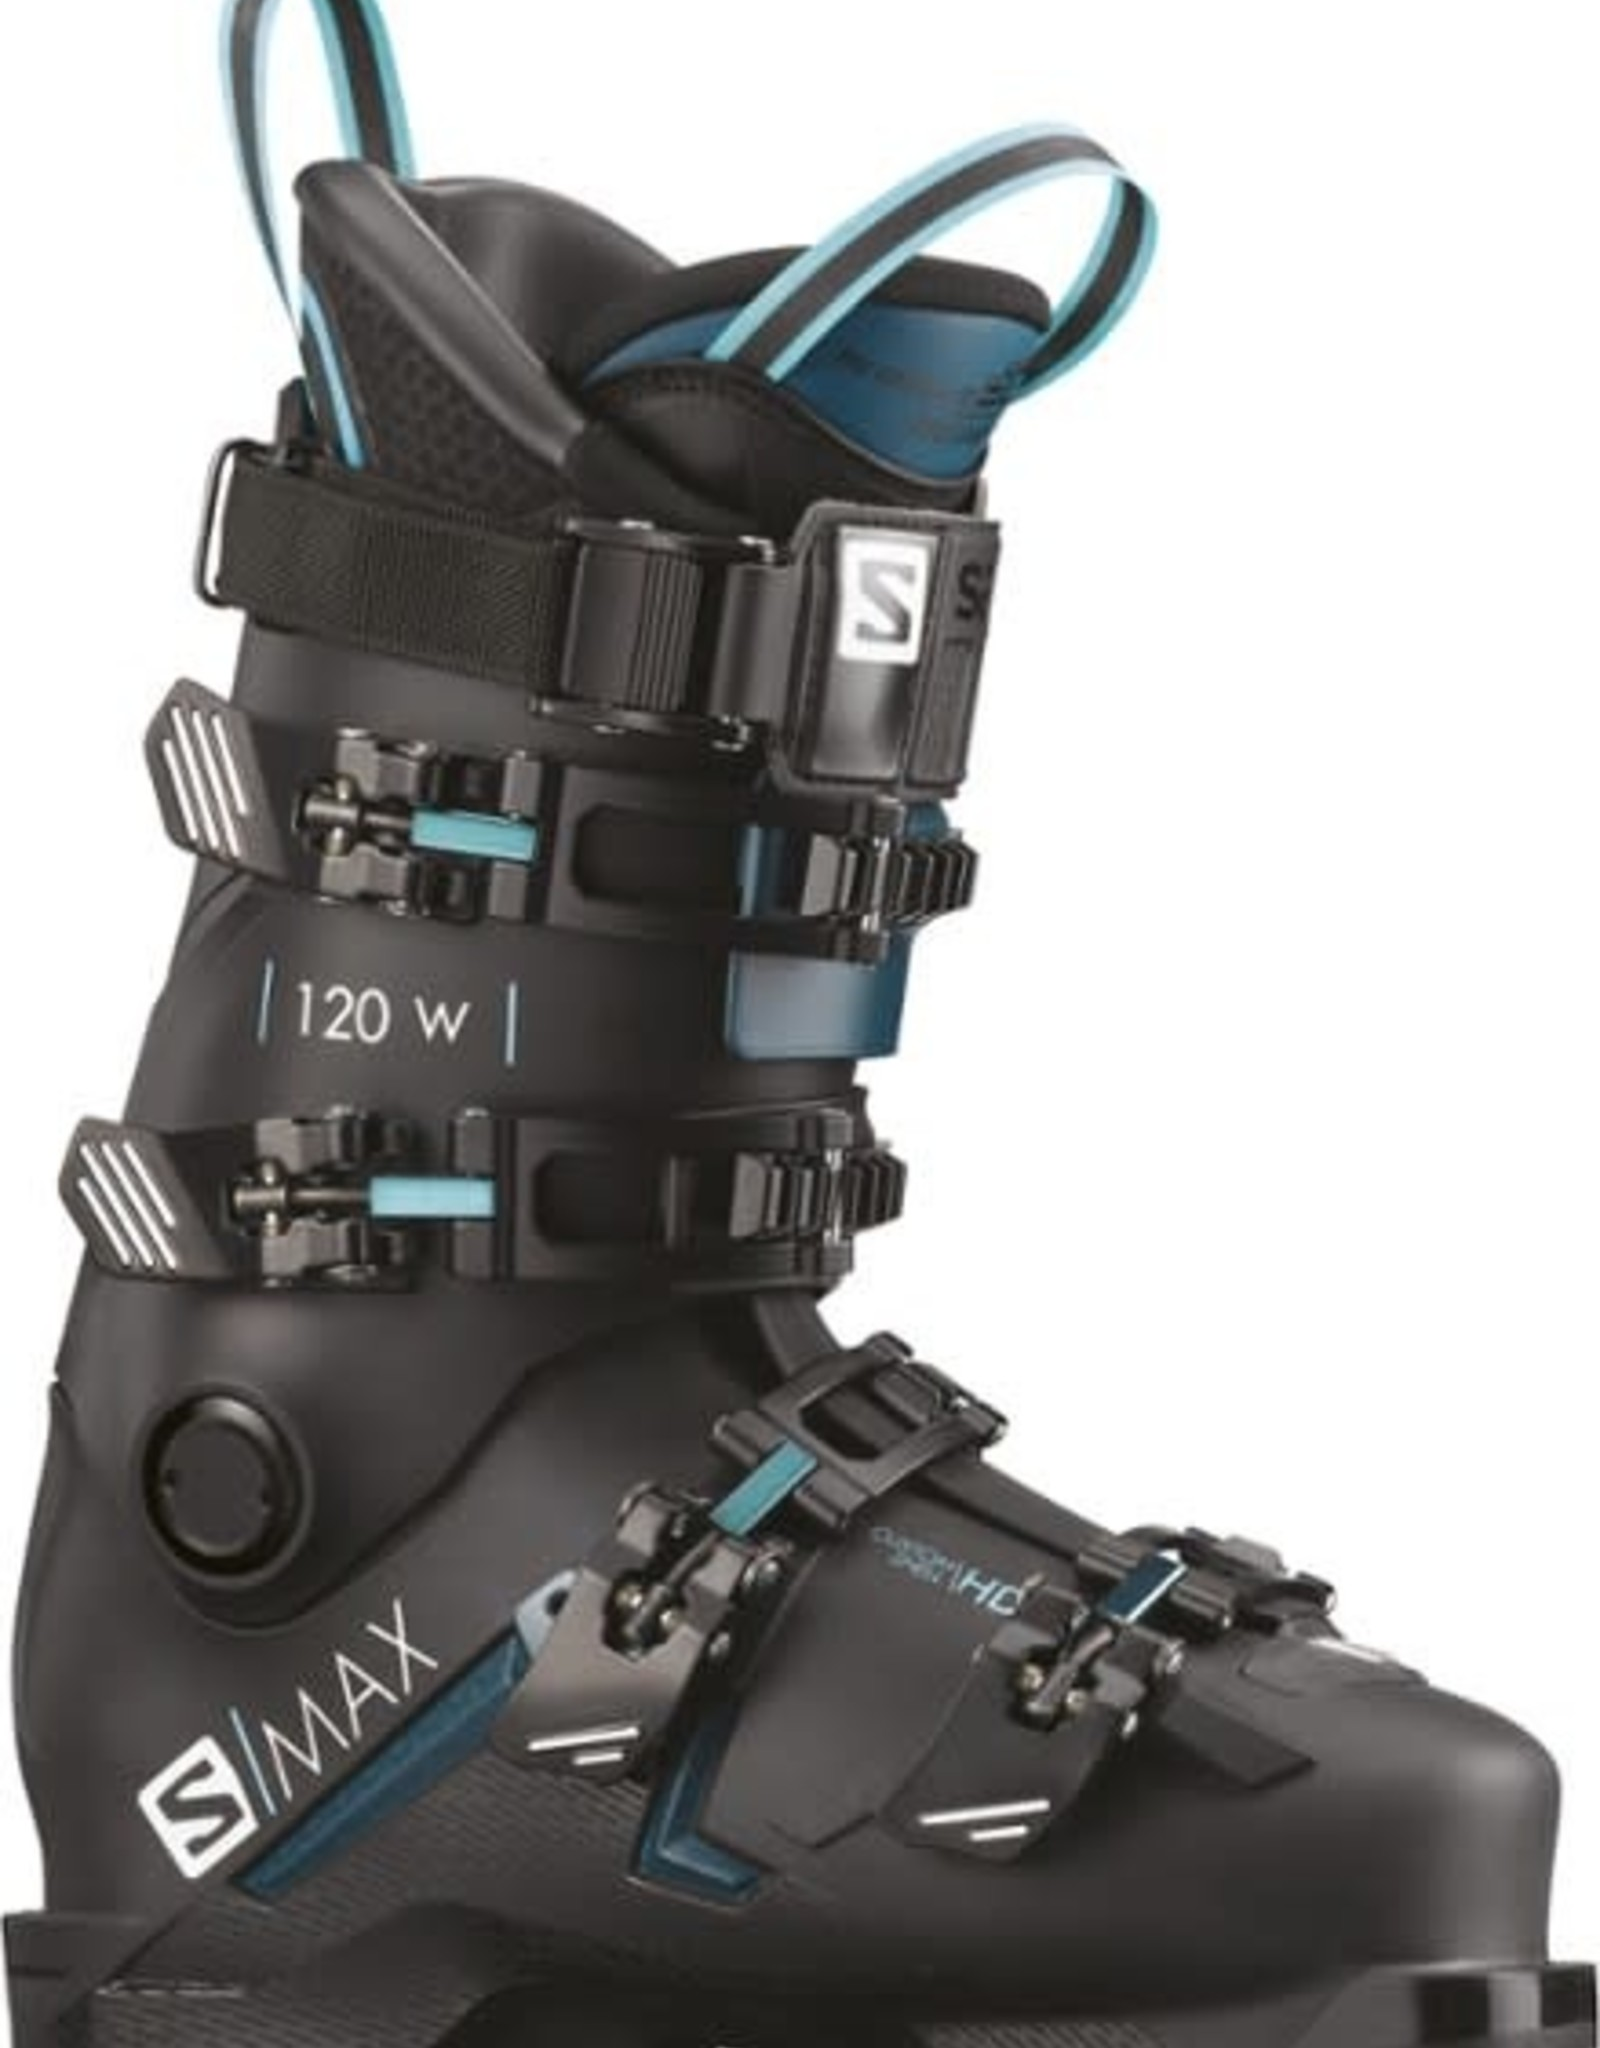 Salomon SALOMON Ski Boots S/MAX 120 W (20/21)